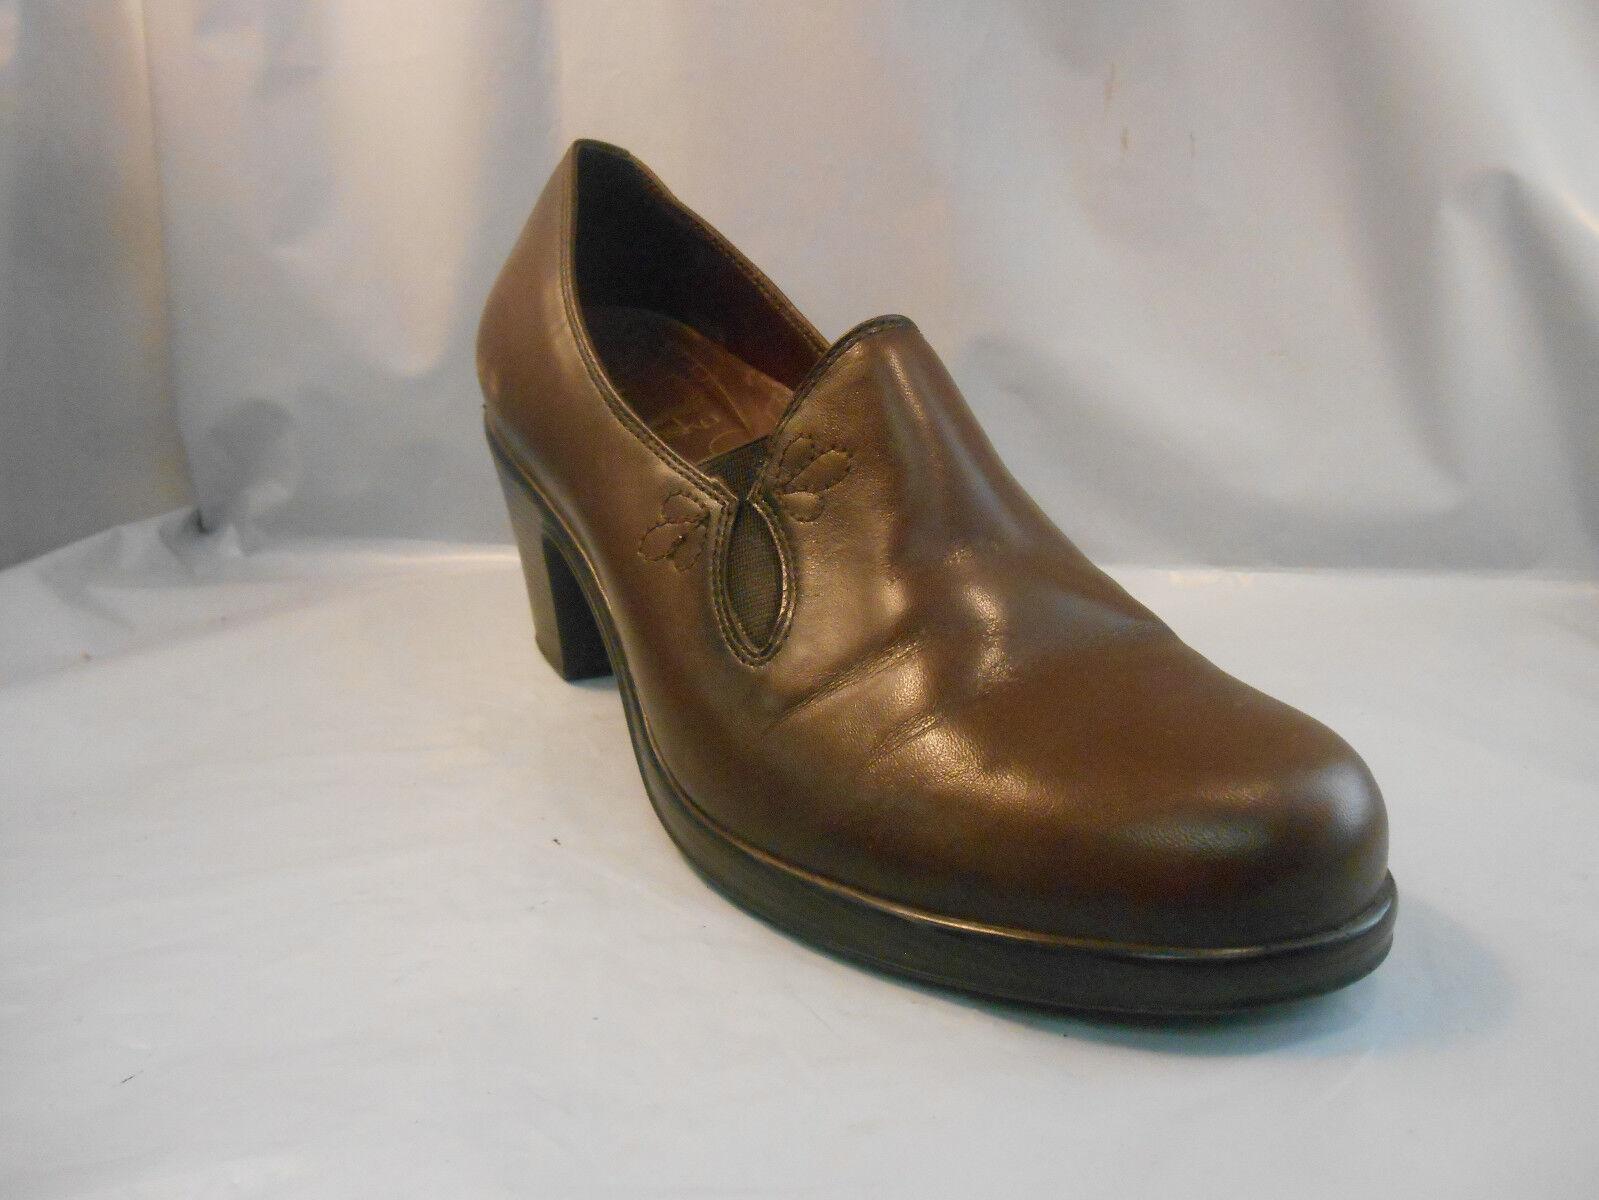 Dansko Beth Brown Leather Loafers shoes Women's Size 10.5 - 11 ; 41 EUR